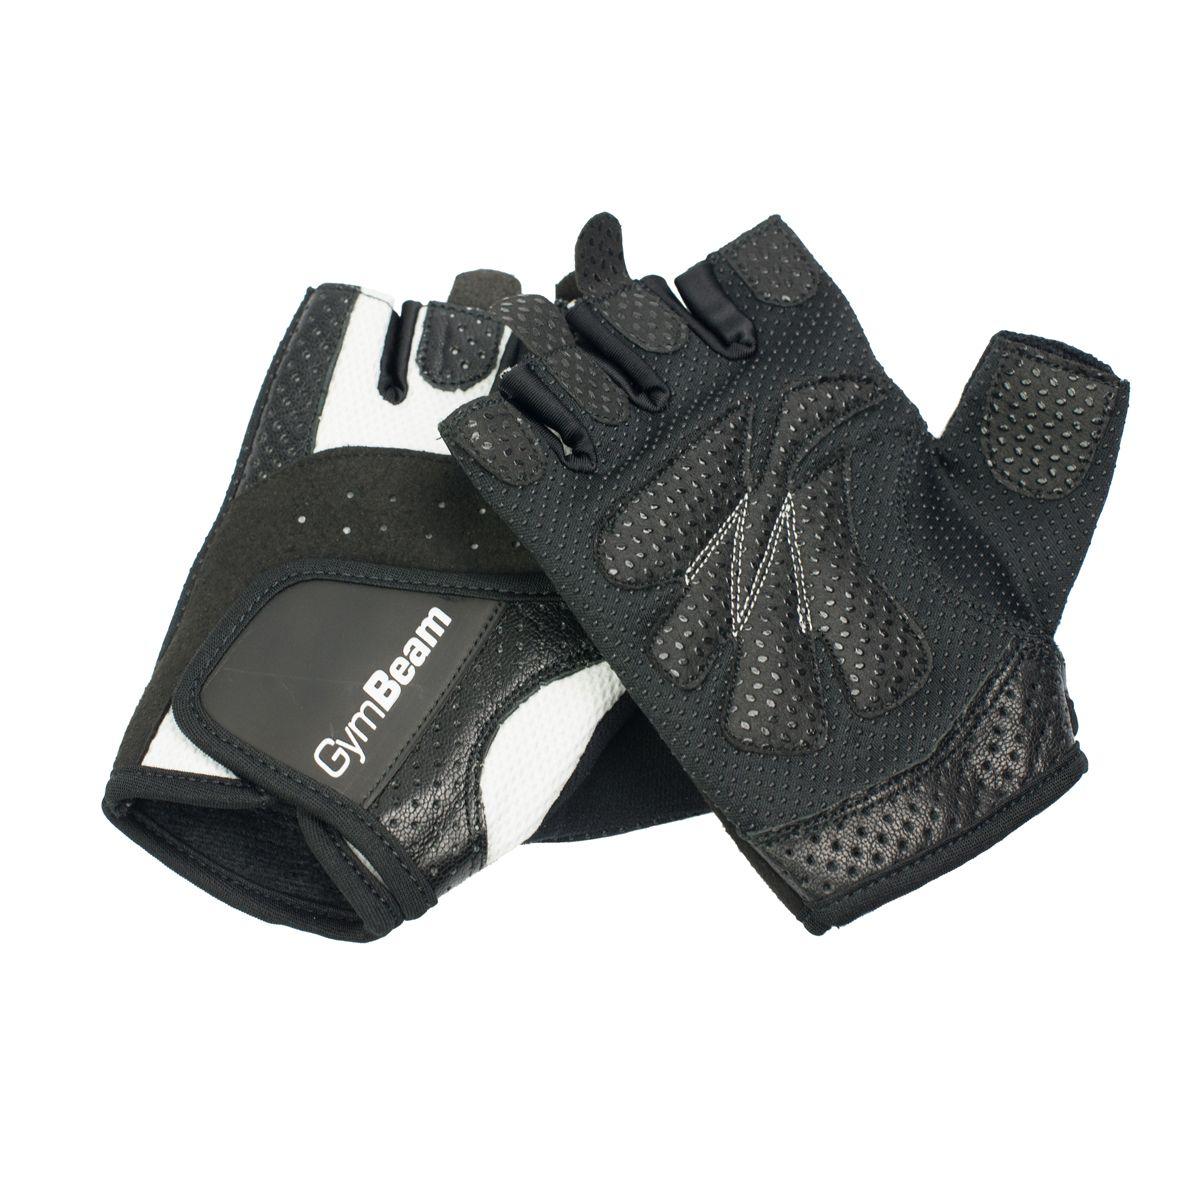 Fitness Dámske rukavice Bella - Gym Beam - S - bielo-čierne